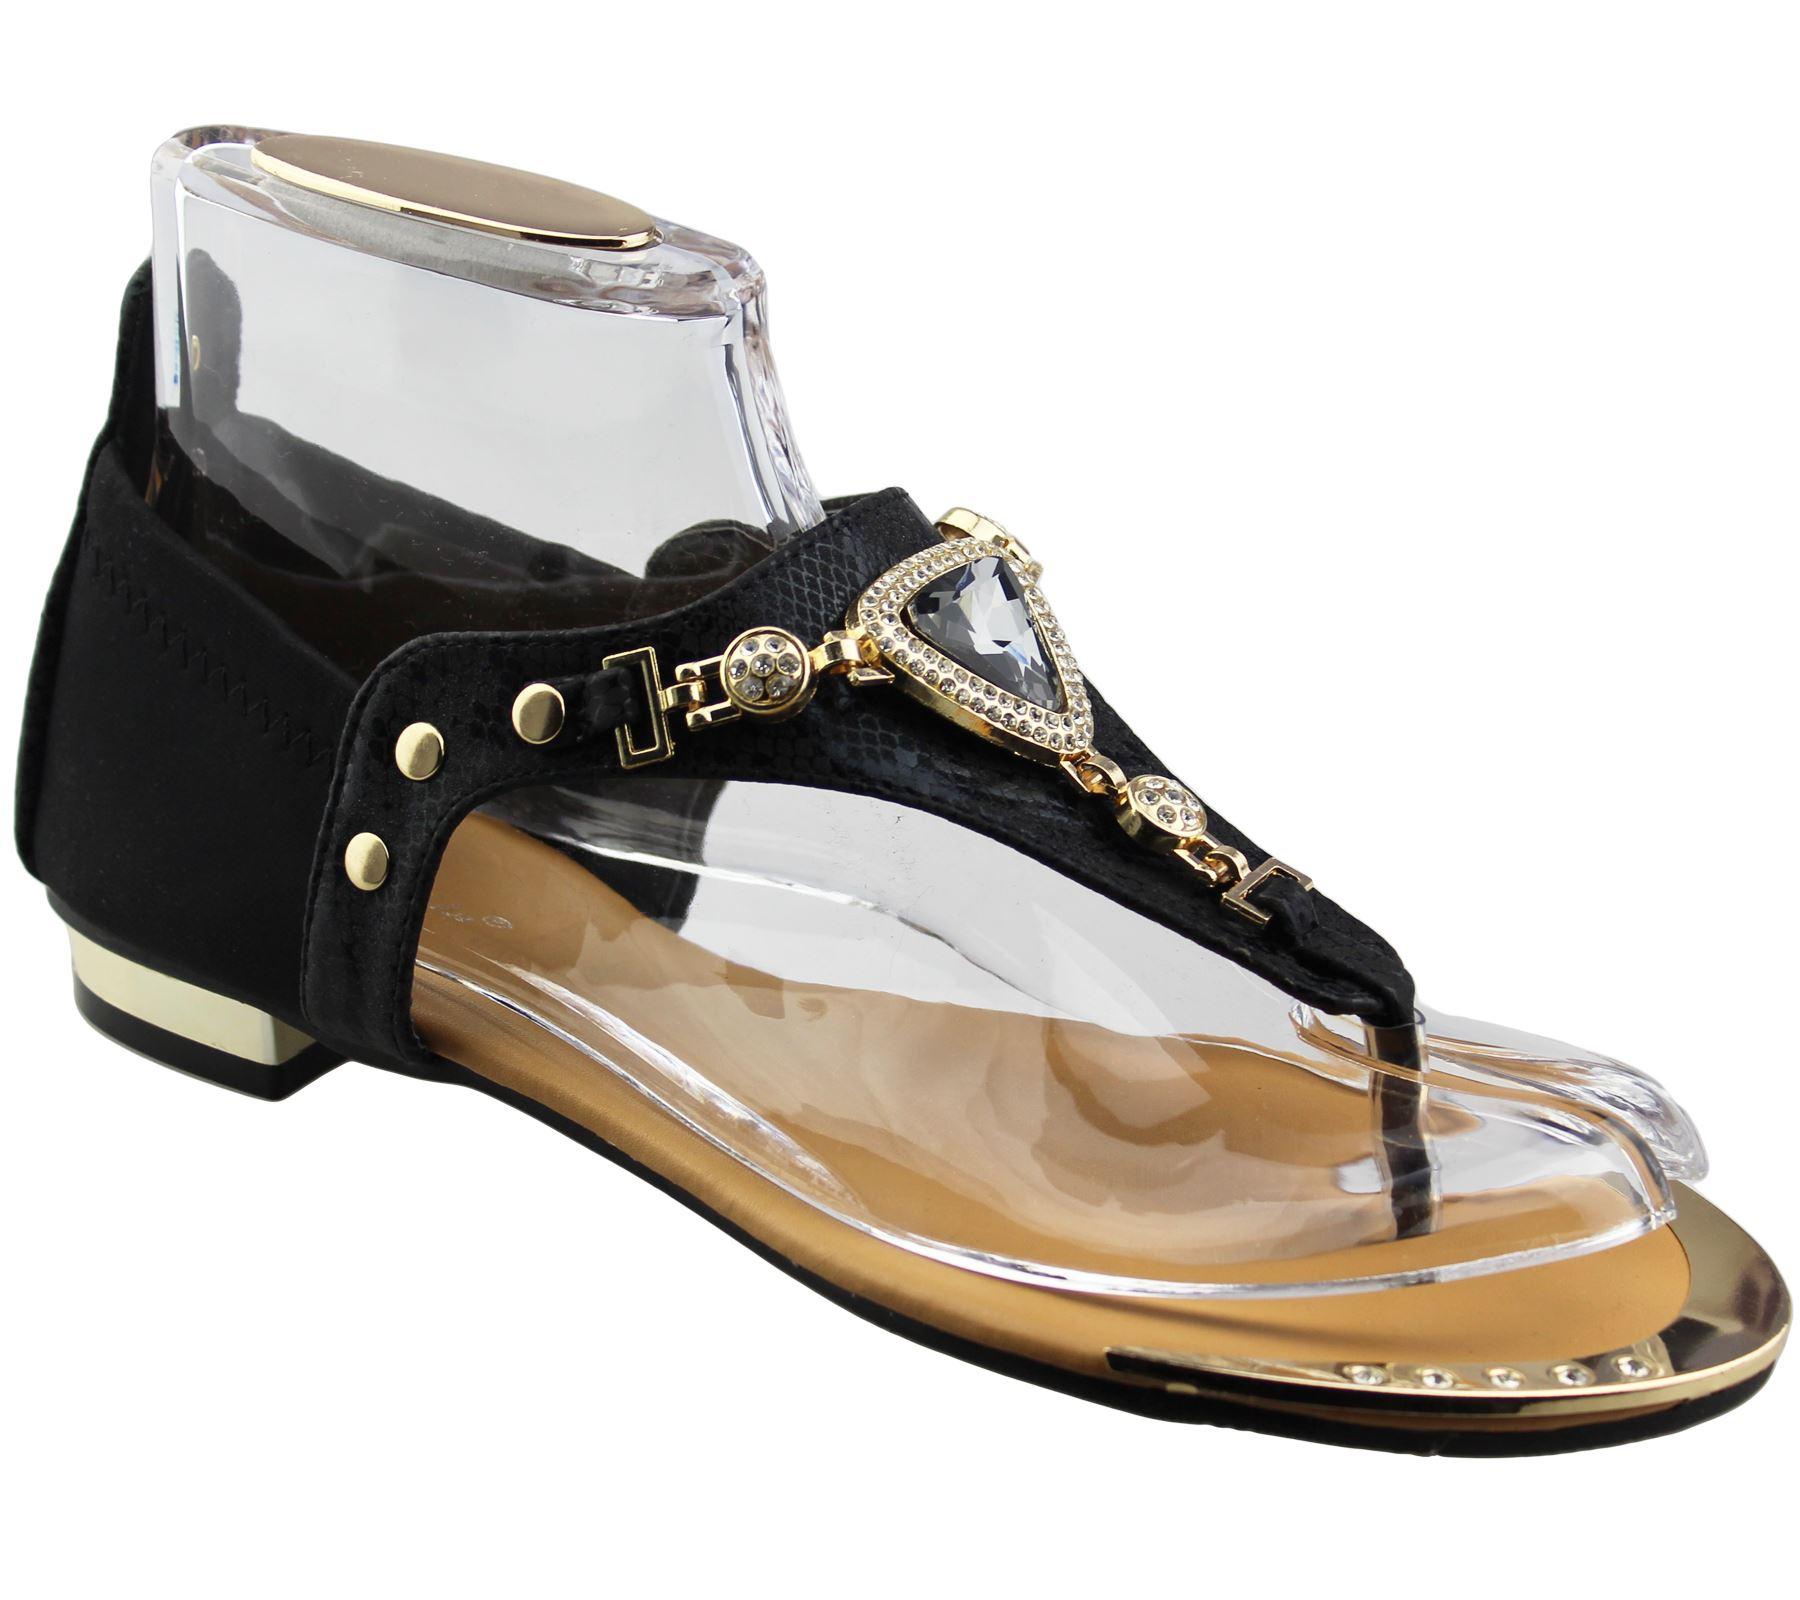 Womens-Flat-Summer-Sandals-Ladies-Diamante-Wedding-Toe-Post-Casual-Slipper thumbnail 6